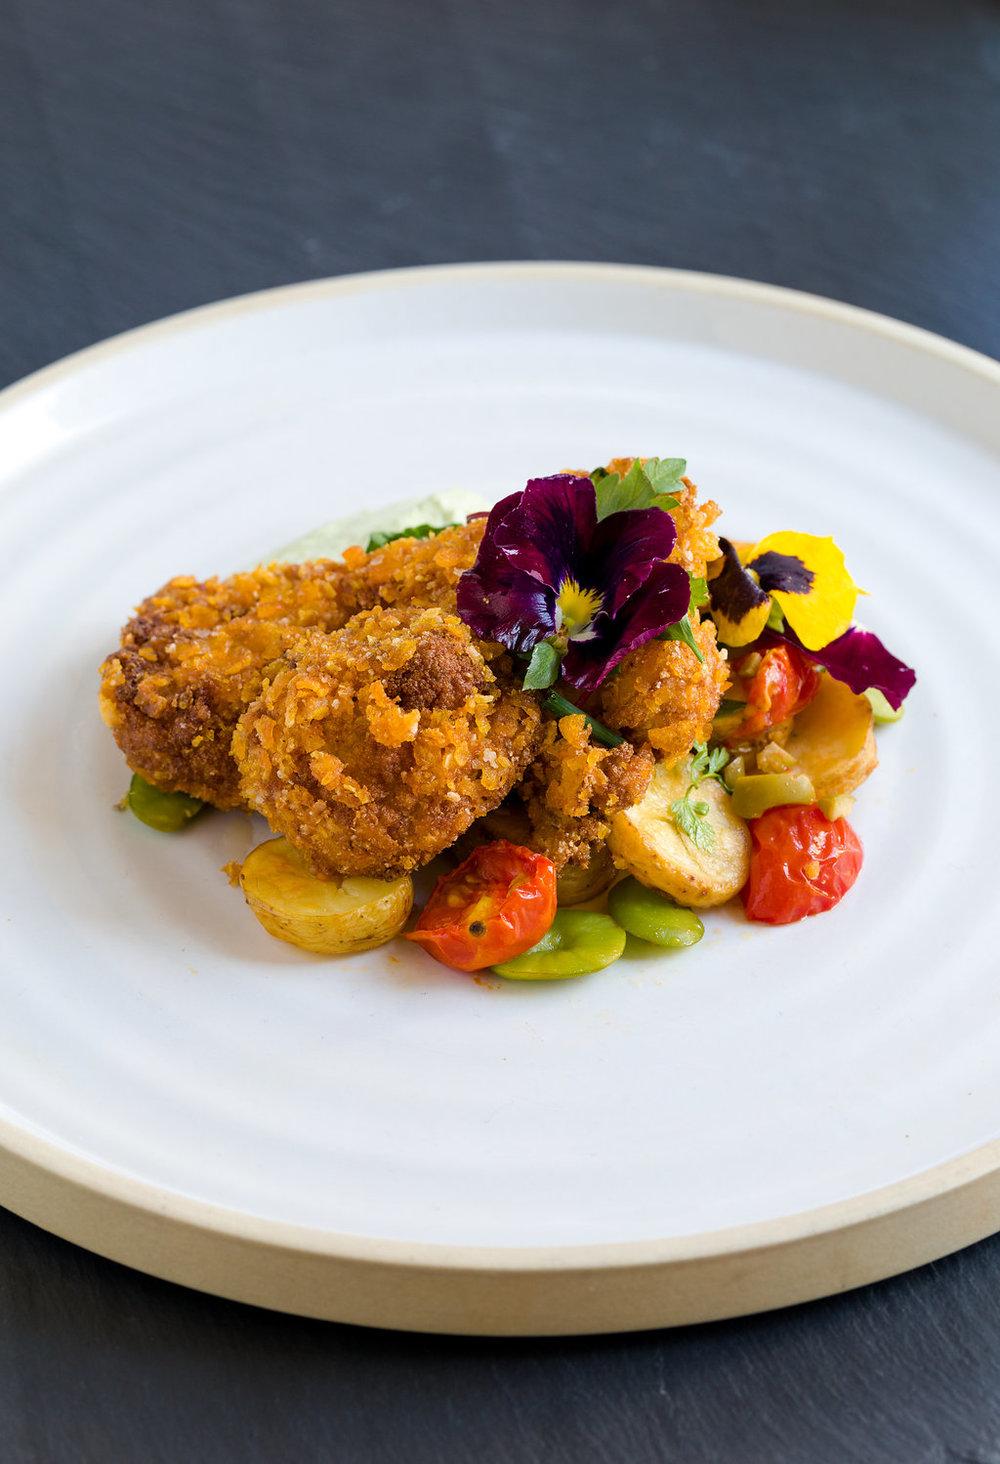 Mock Fried Chicken with Vegan Green Goddess Dressing, Warm Fingerling Potato Salad_v.jpg